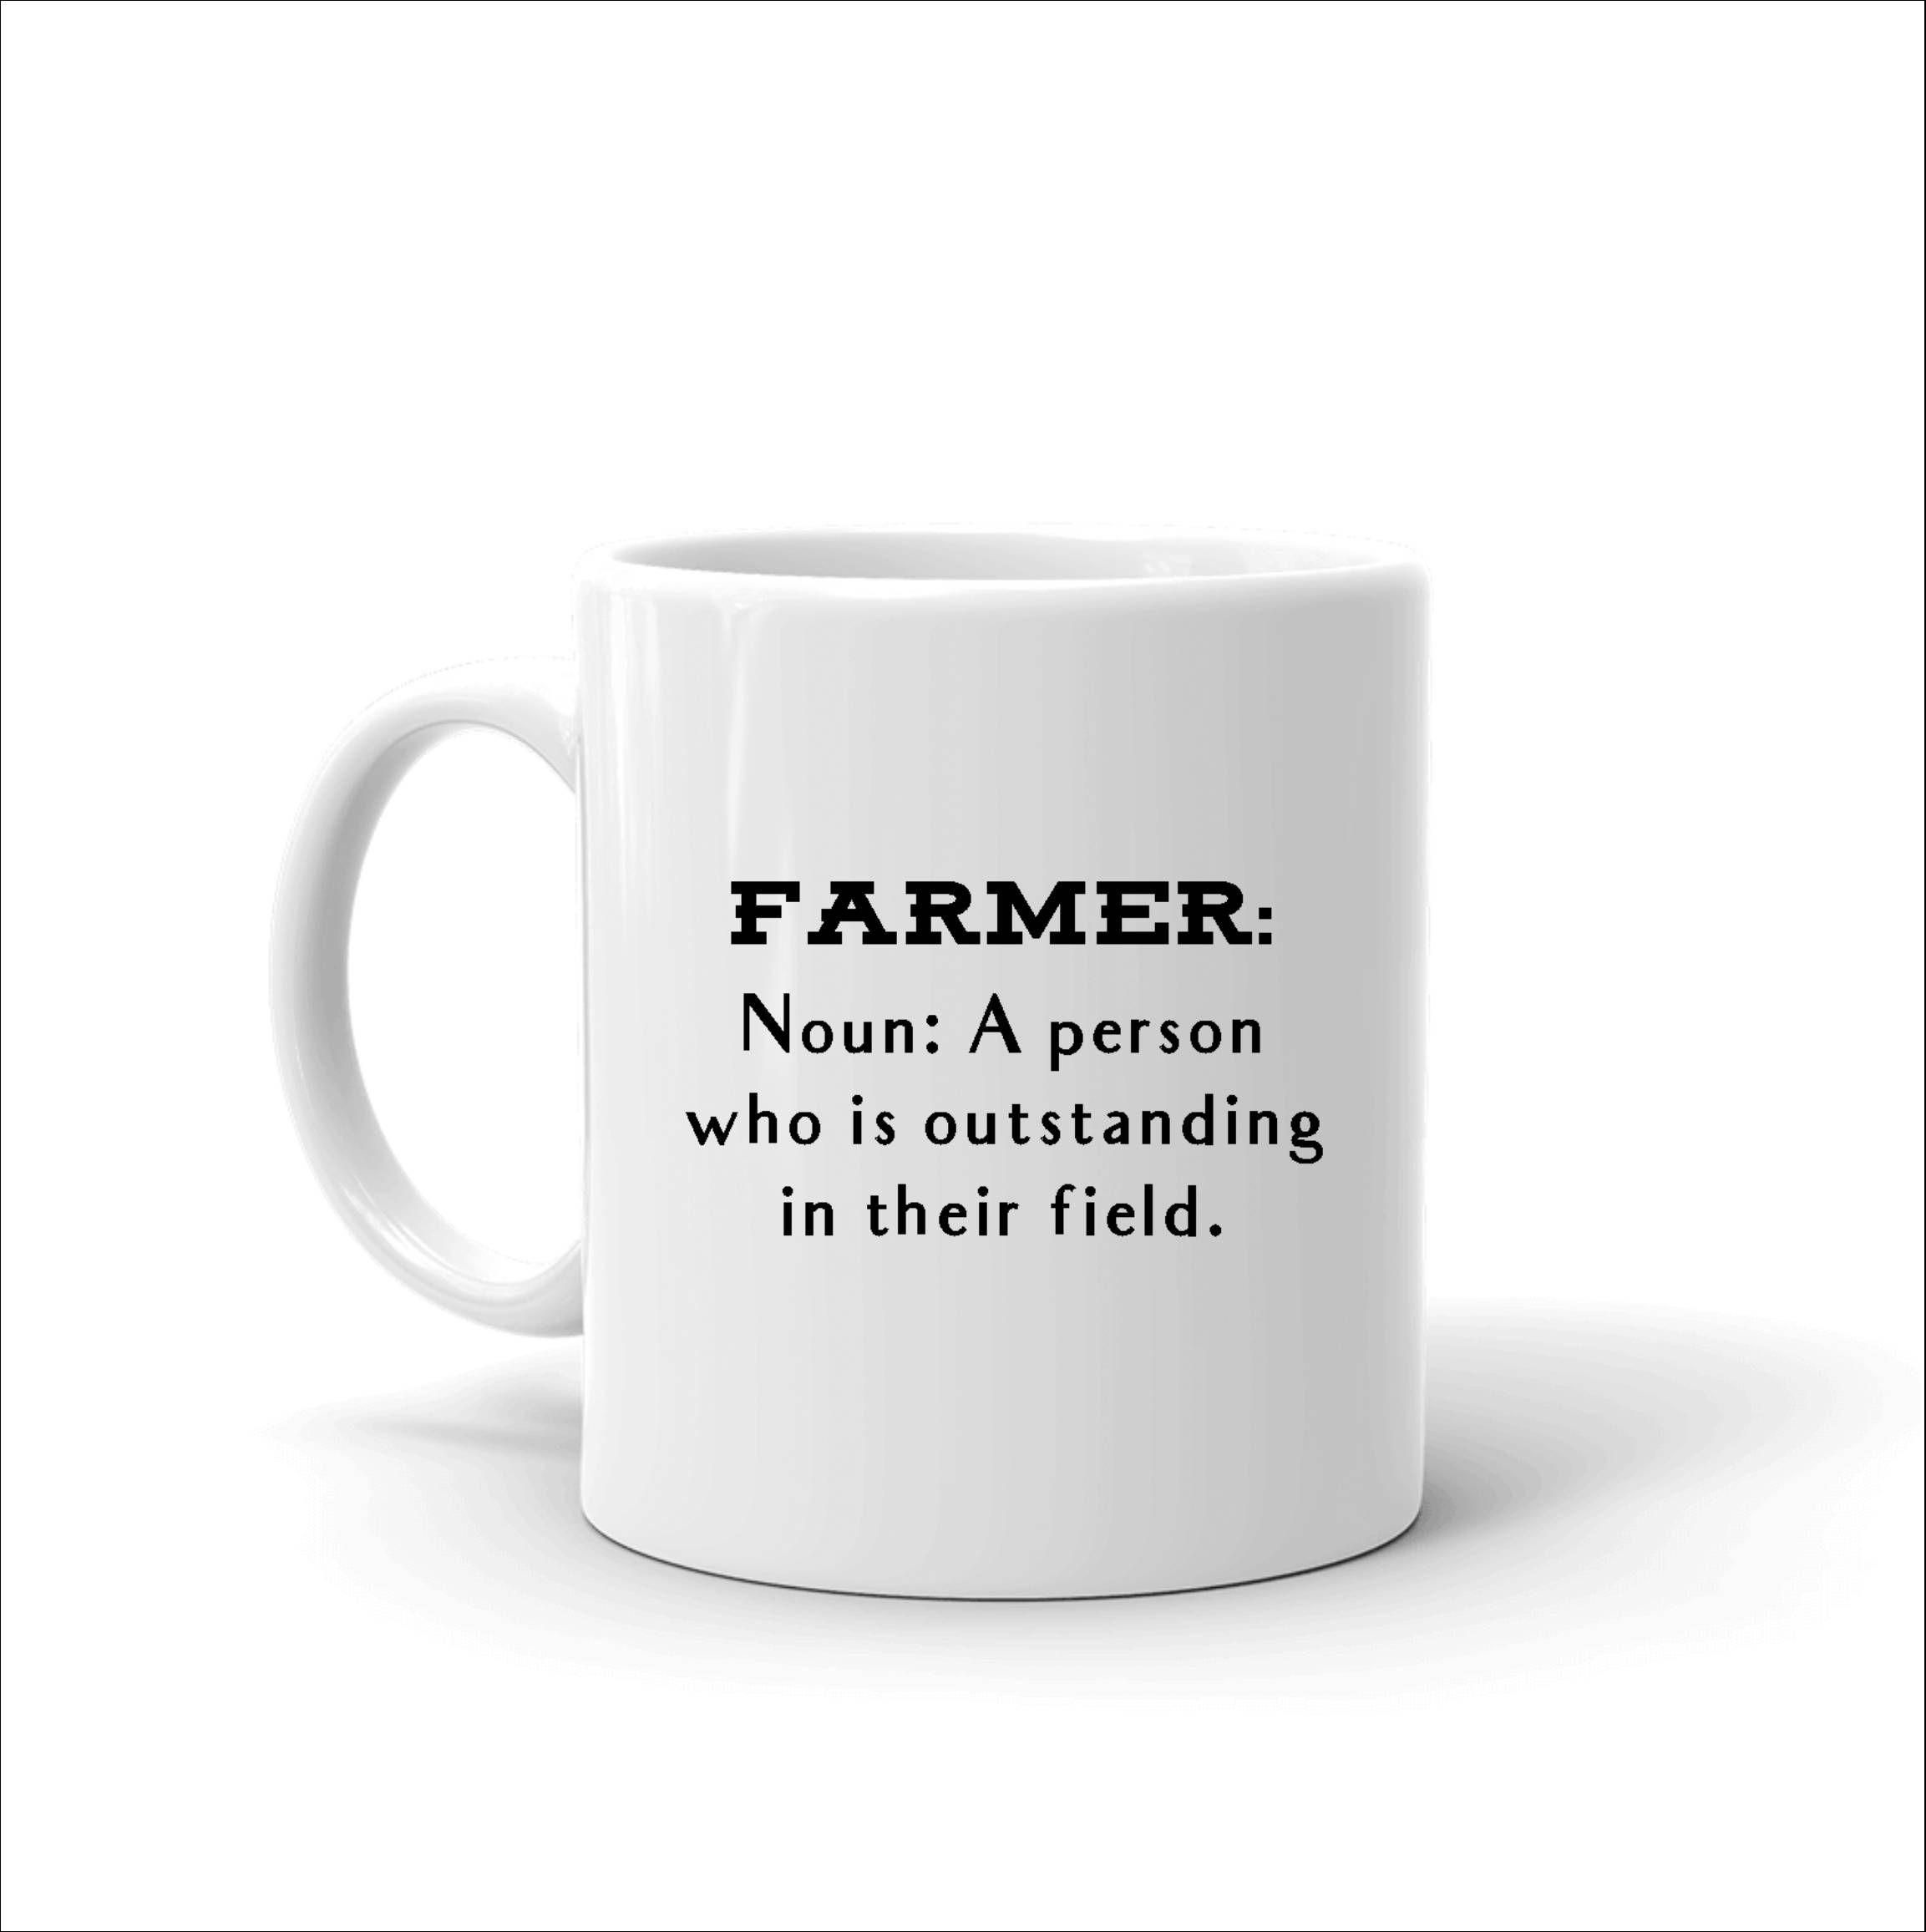 Farmer Mug, Funny Farm Pun, Farmer Cup, Farmers Wife Mug